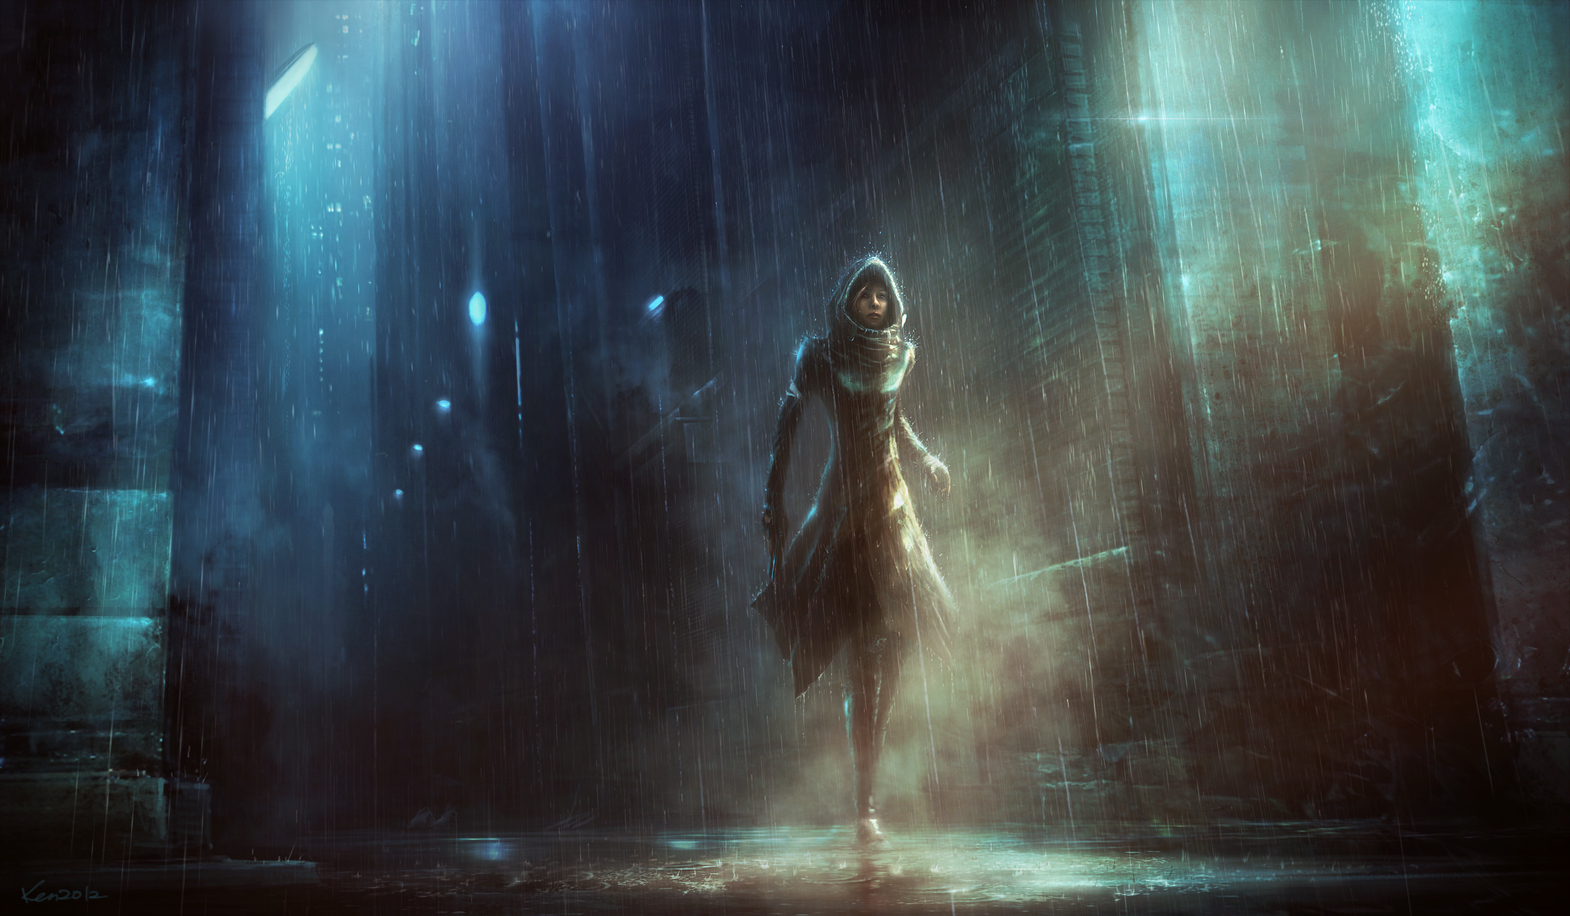 Rain by korbox